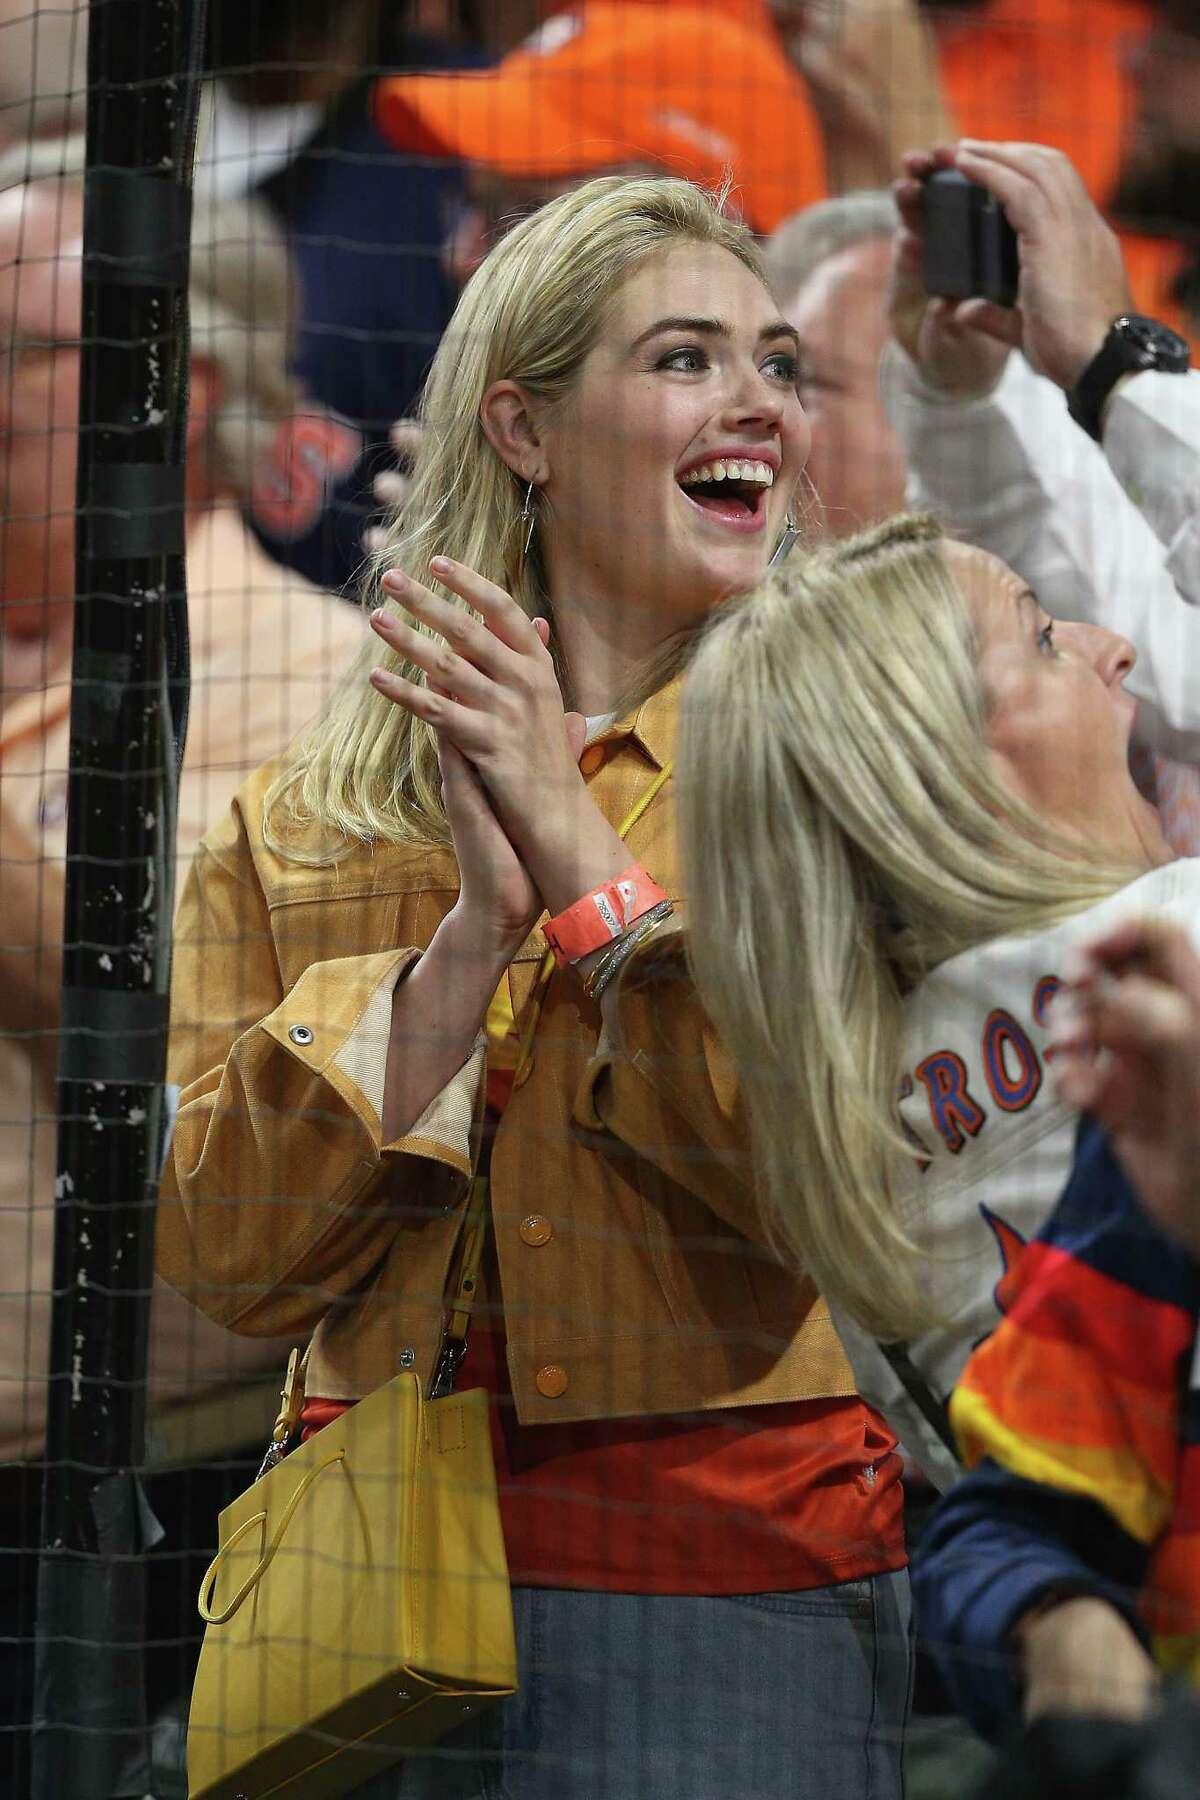 Kate Upton Model/actress, wife of Astros pitcher Justin Verlander